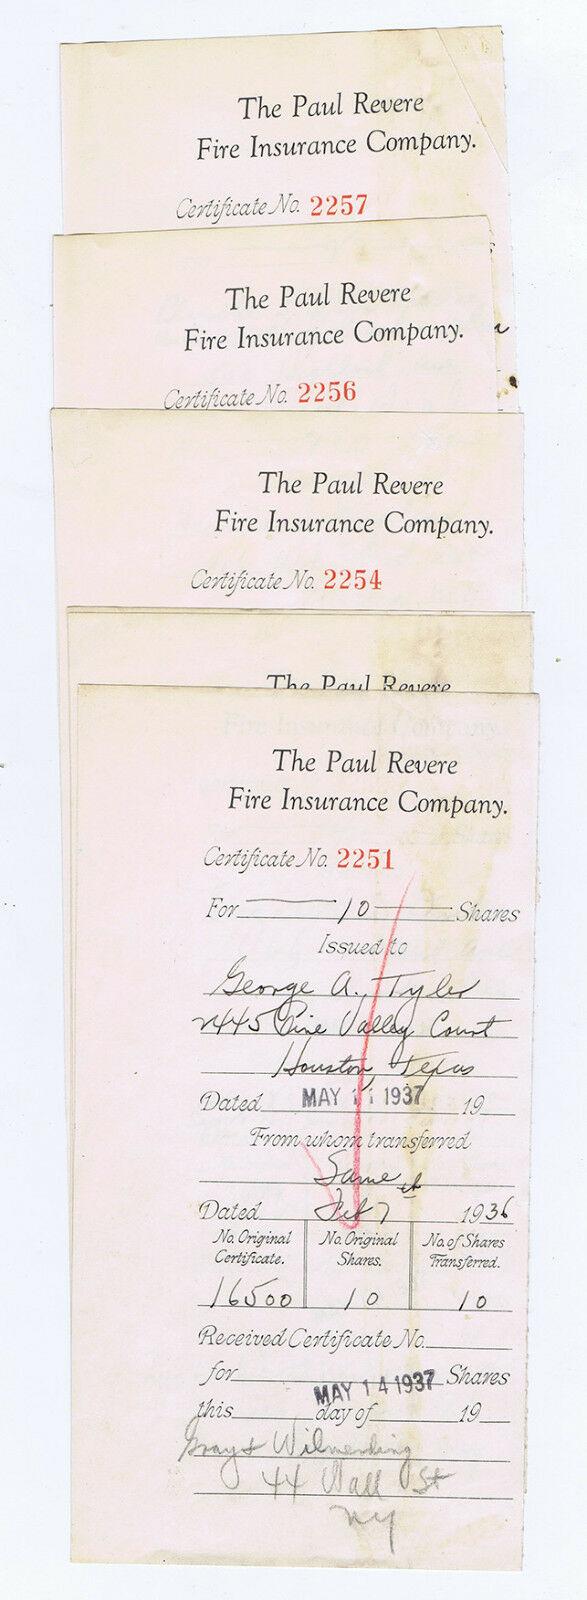 WHOLESALE 100 PAUL REVERE FIRE INSURANCE CO. SHARES COUNTERFOIL DEPRESSION 1937